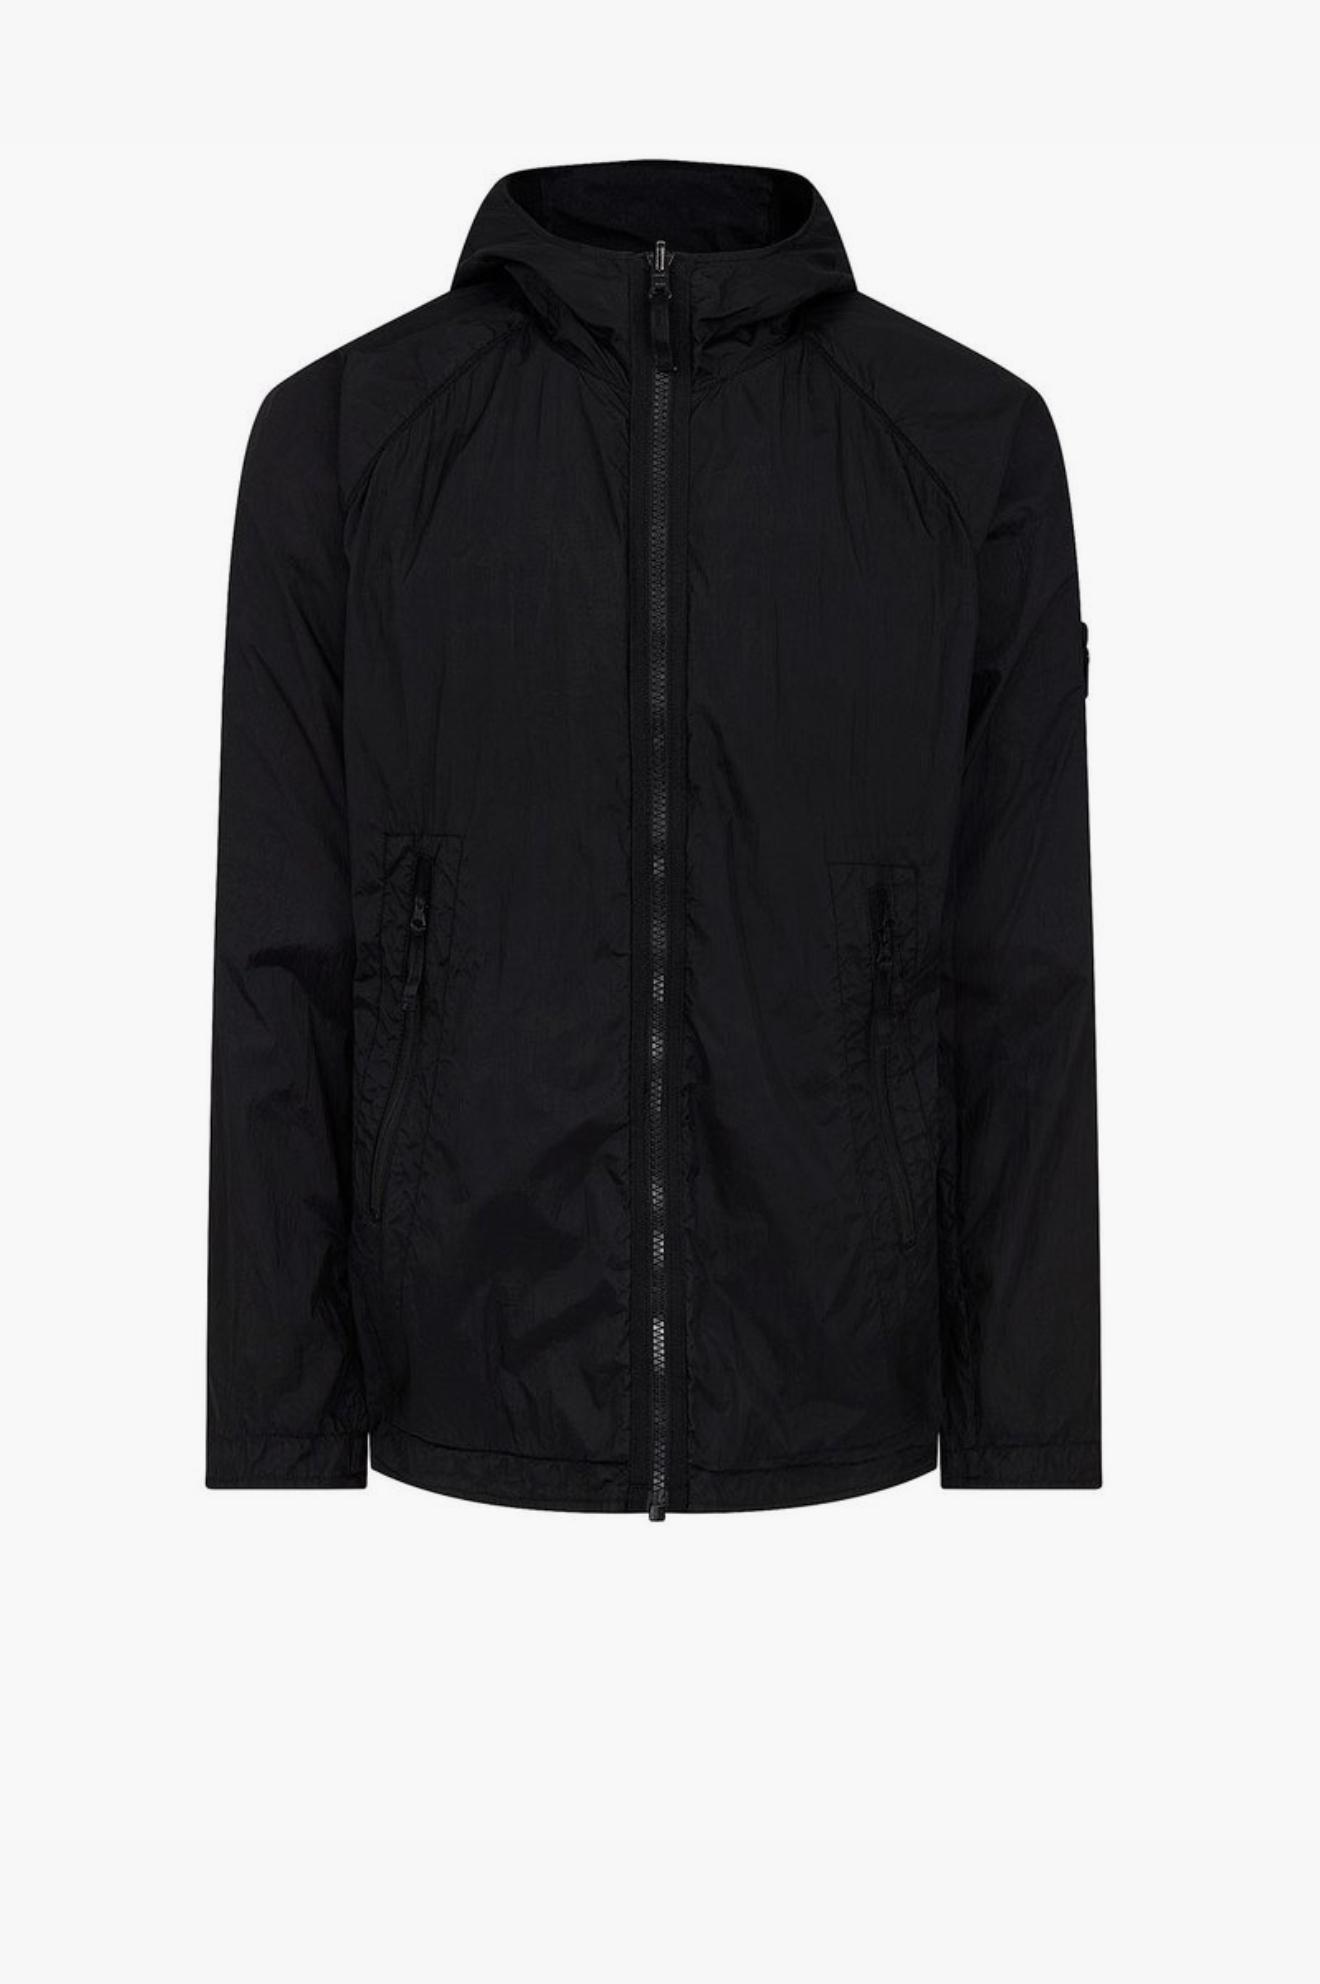 Ghost Piece Stretch Wool / Nylon (Reversible) Black